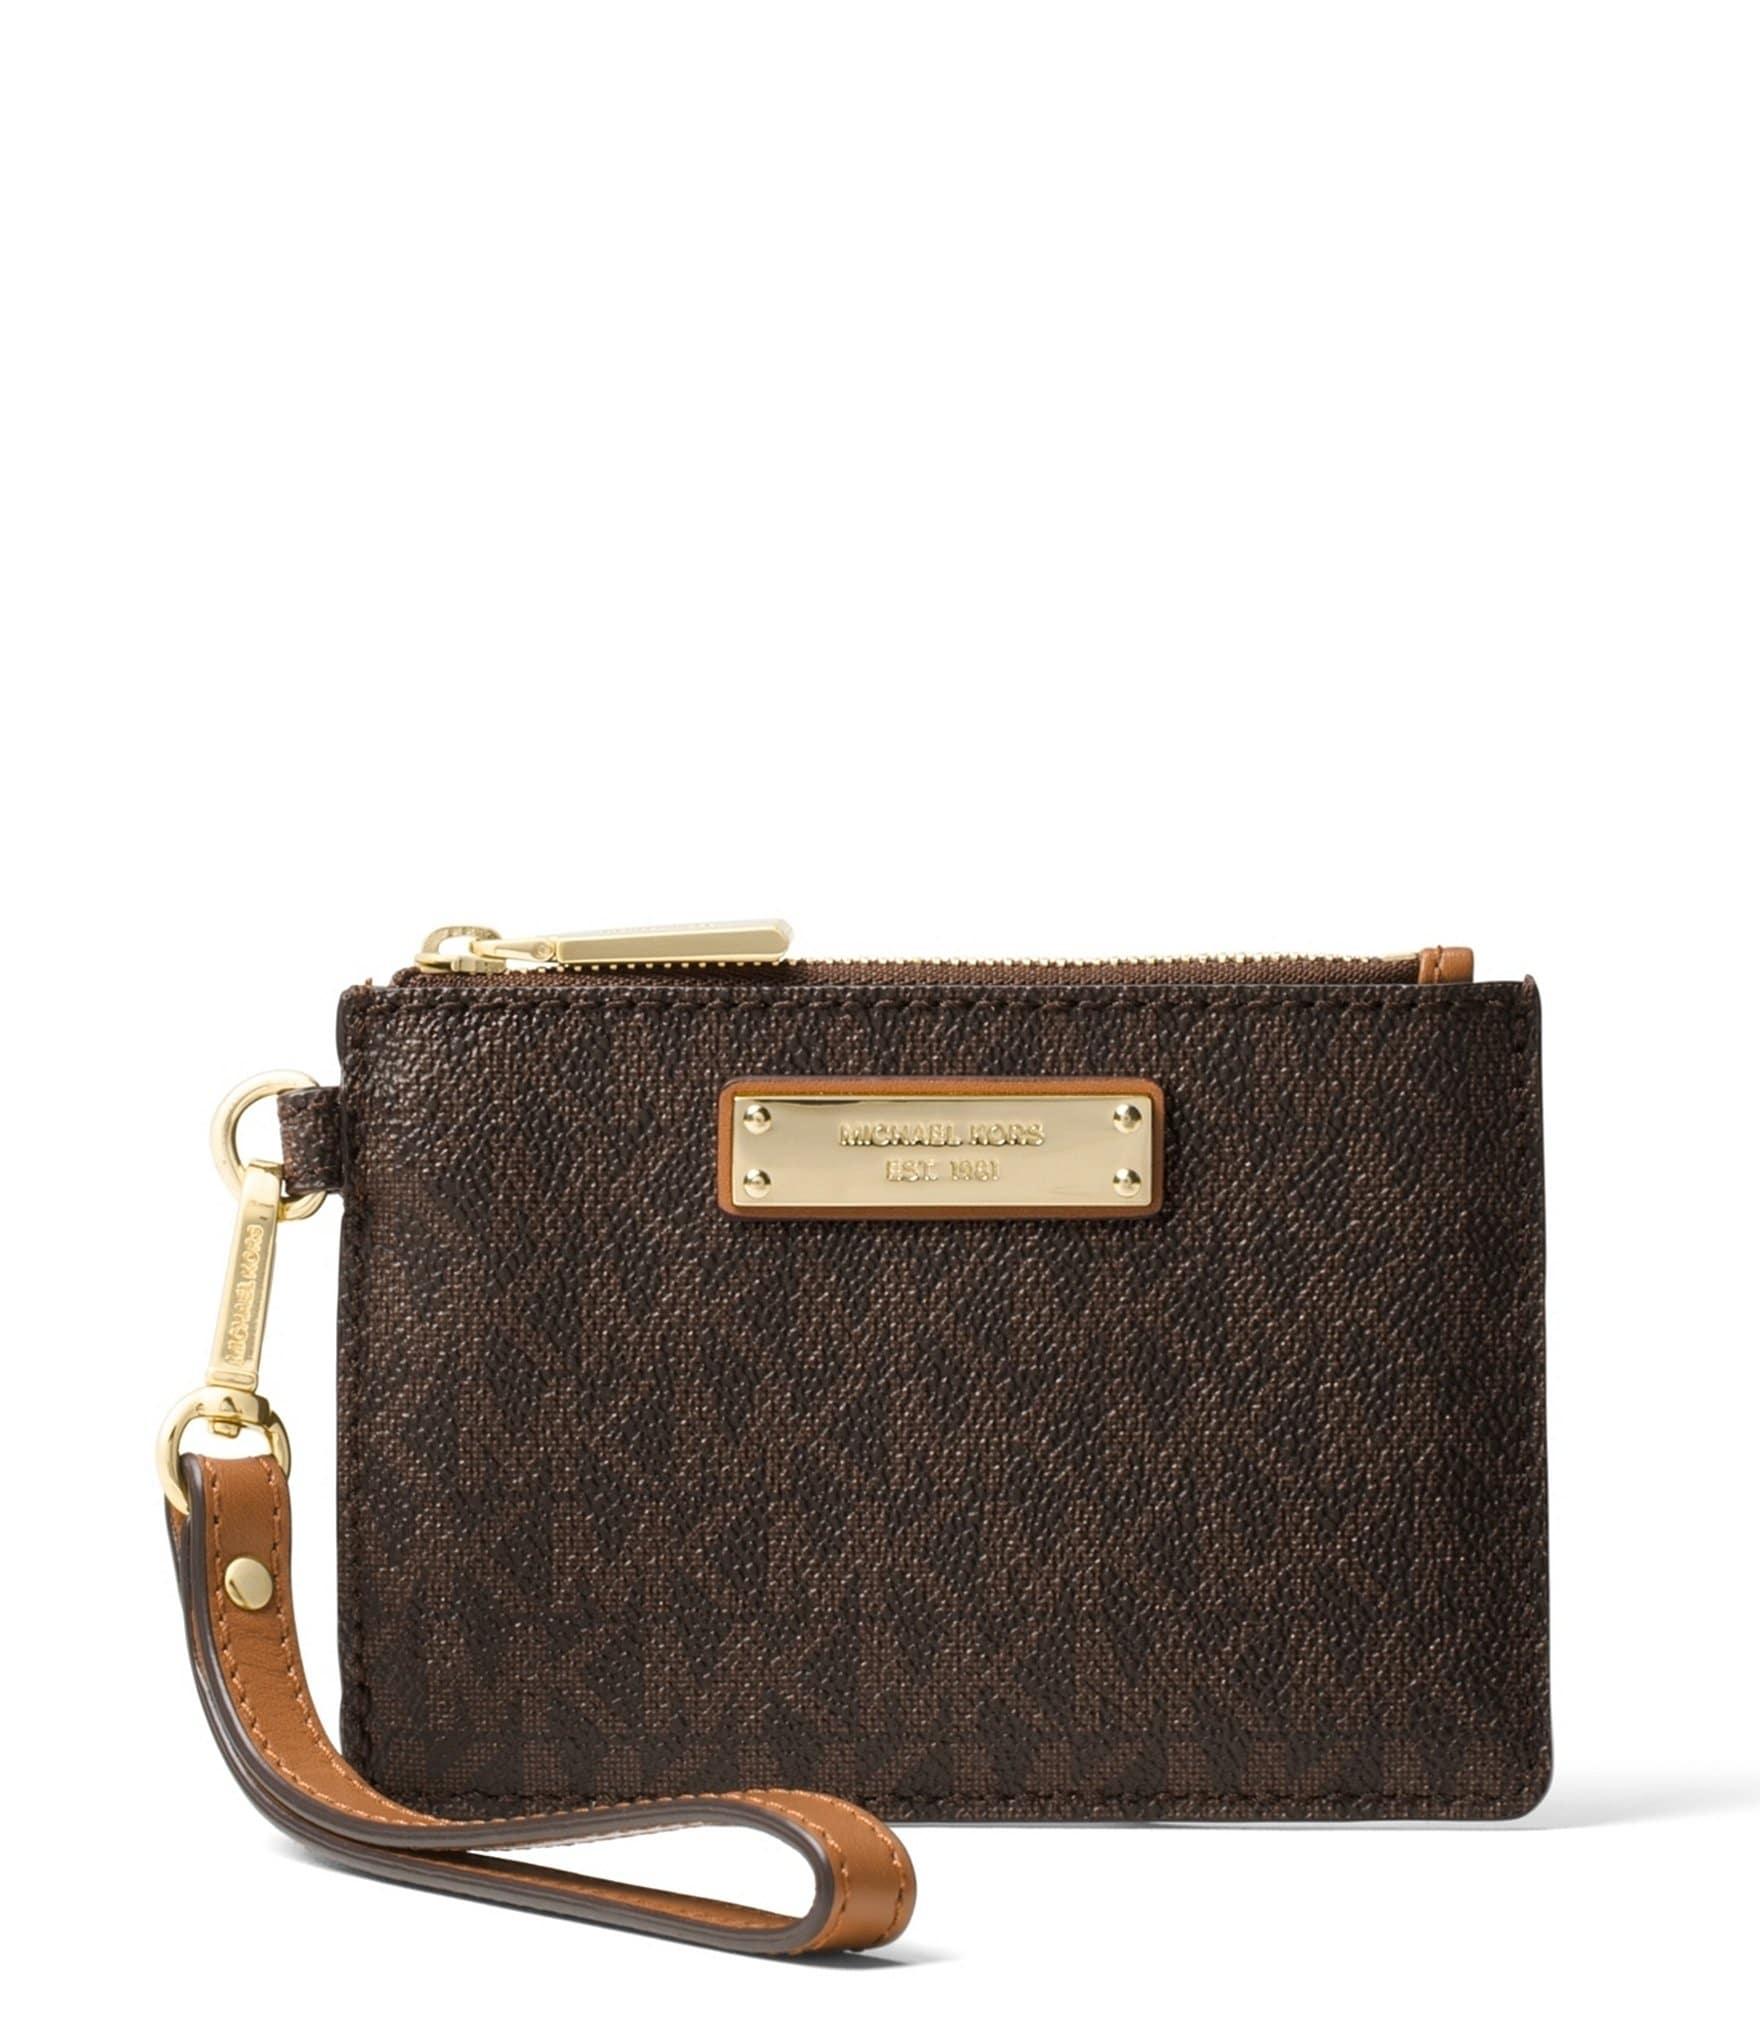 ff8febf3b20c Handbags | Wristlets, Keychains, & Cases | Coin Purses | Dillard's